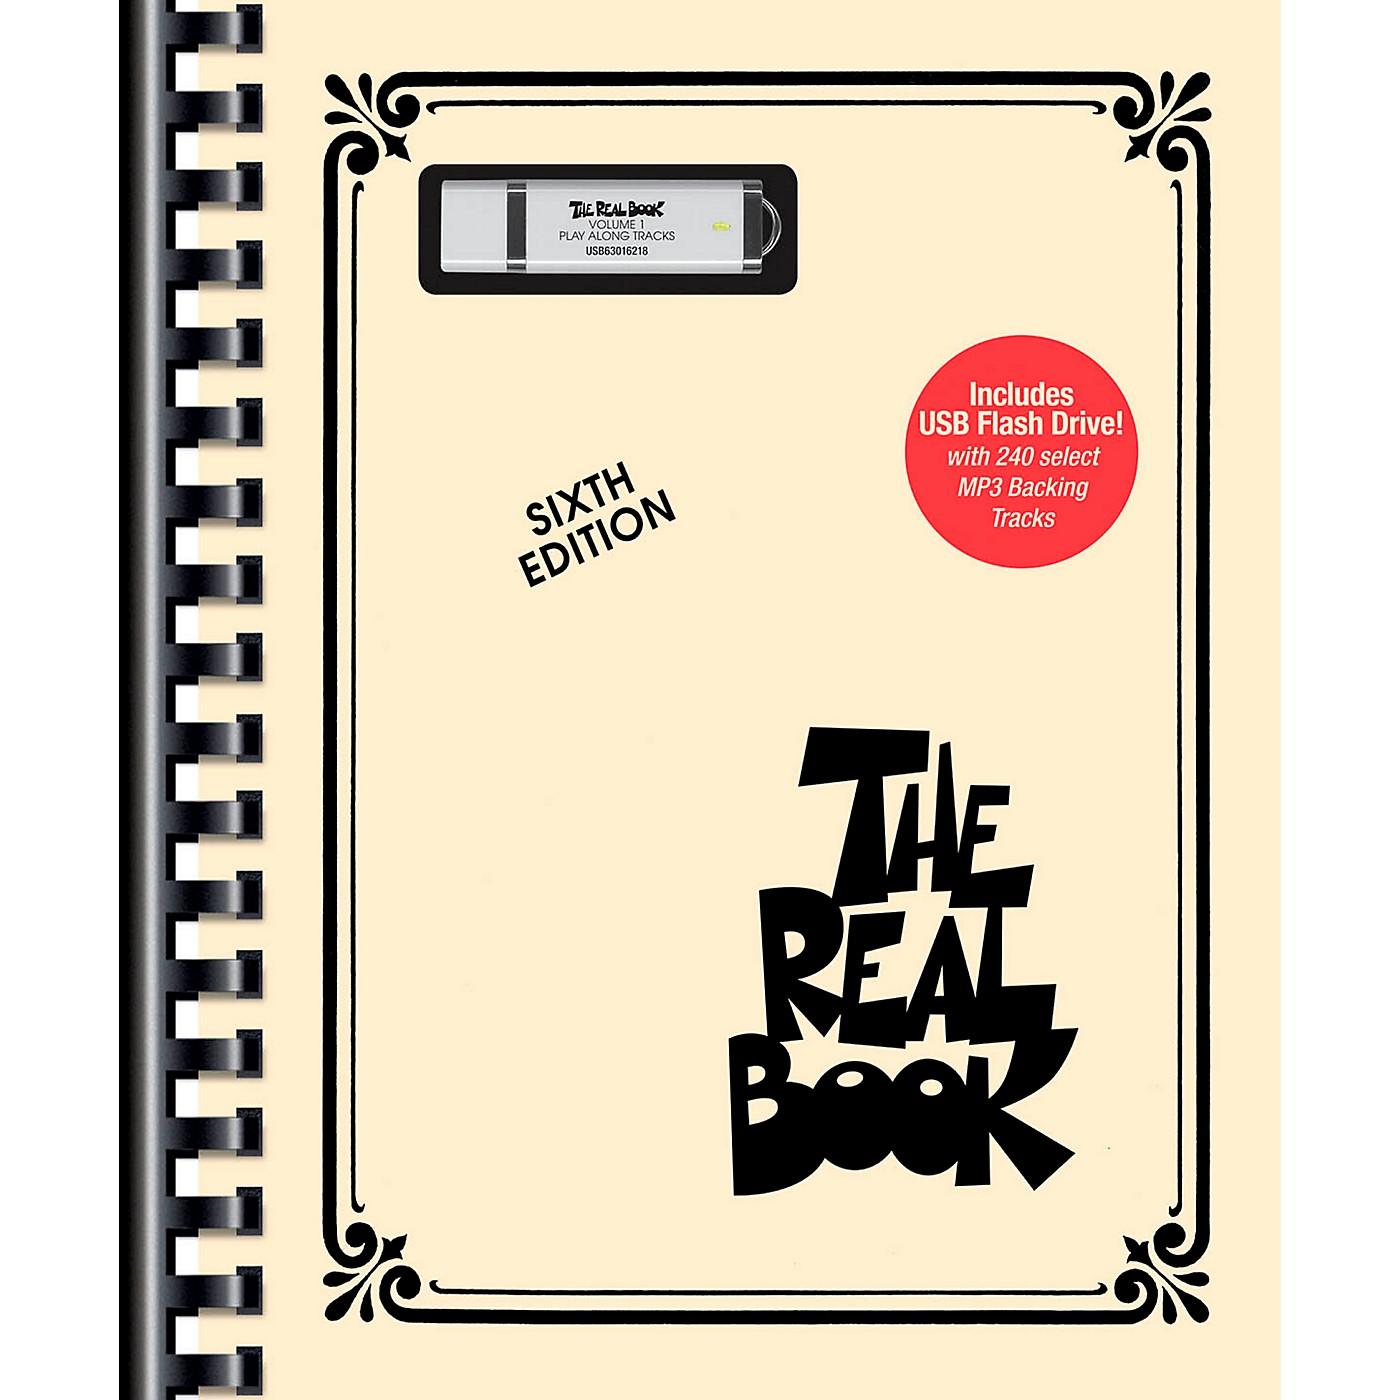 Hal Leonard The Real Book Volume 1 Book/USB Flash Drive Play-Along Pack thumbnail